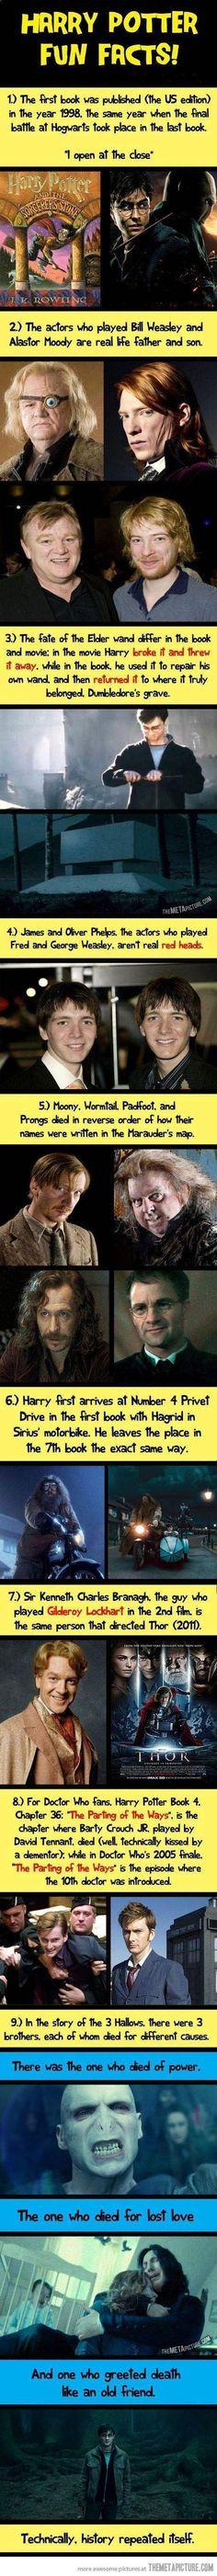 Harry Potter fun trivia